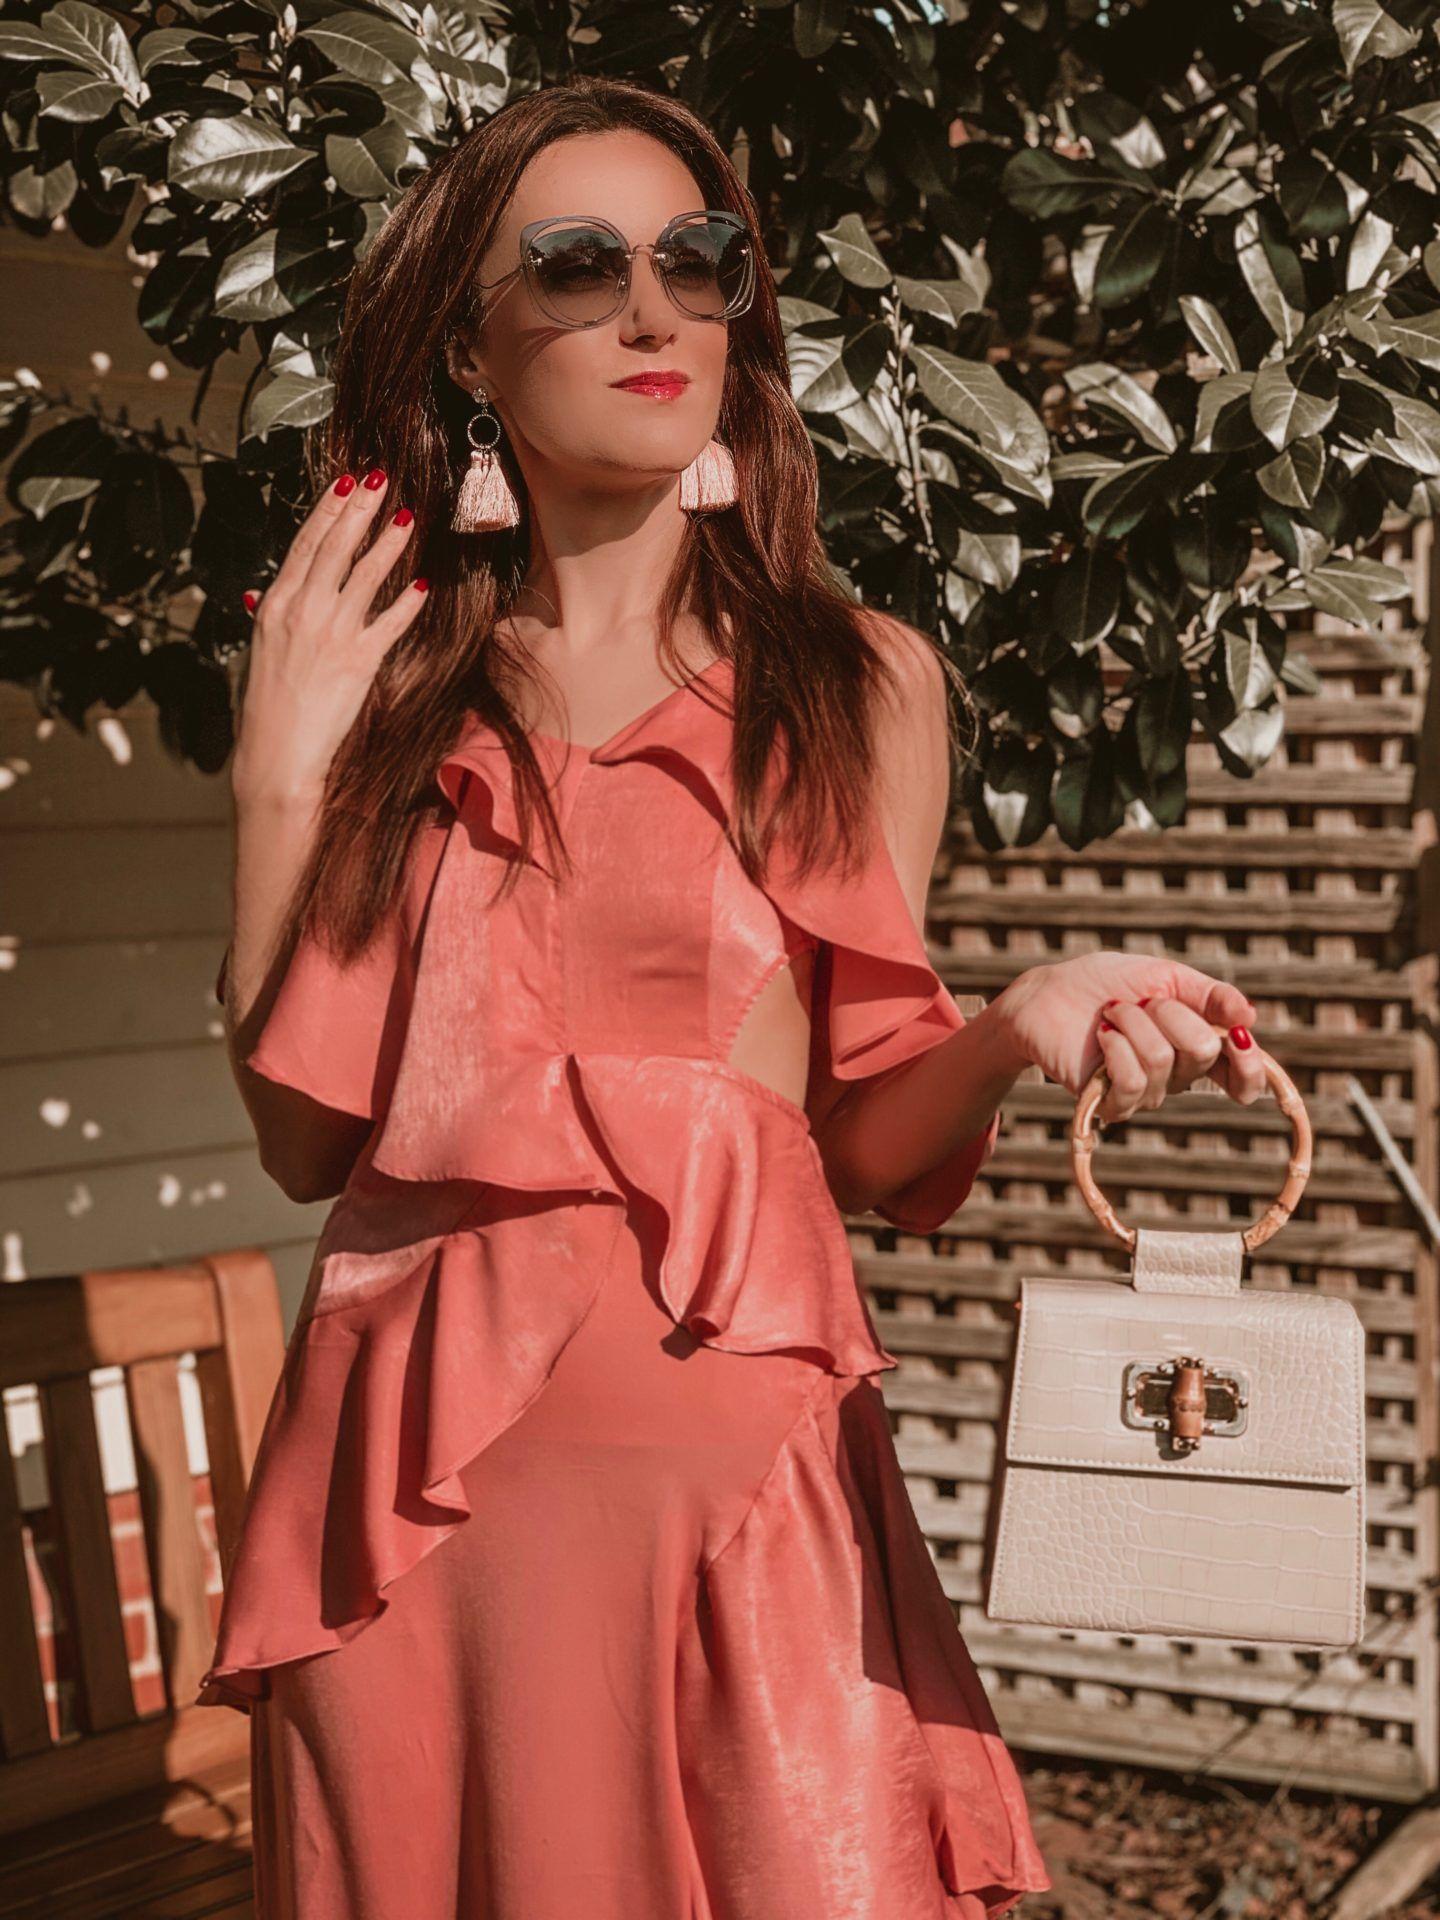 ASOS DESIGN floaty satin ruffle maxi dress | Miu Miu sunglasses | Liars & Lovers cream mock croc bamboo handle cross body bag | Carvela Pointed Asymmetric Strap Heels